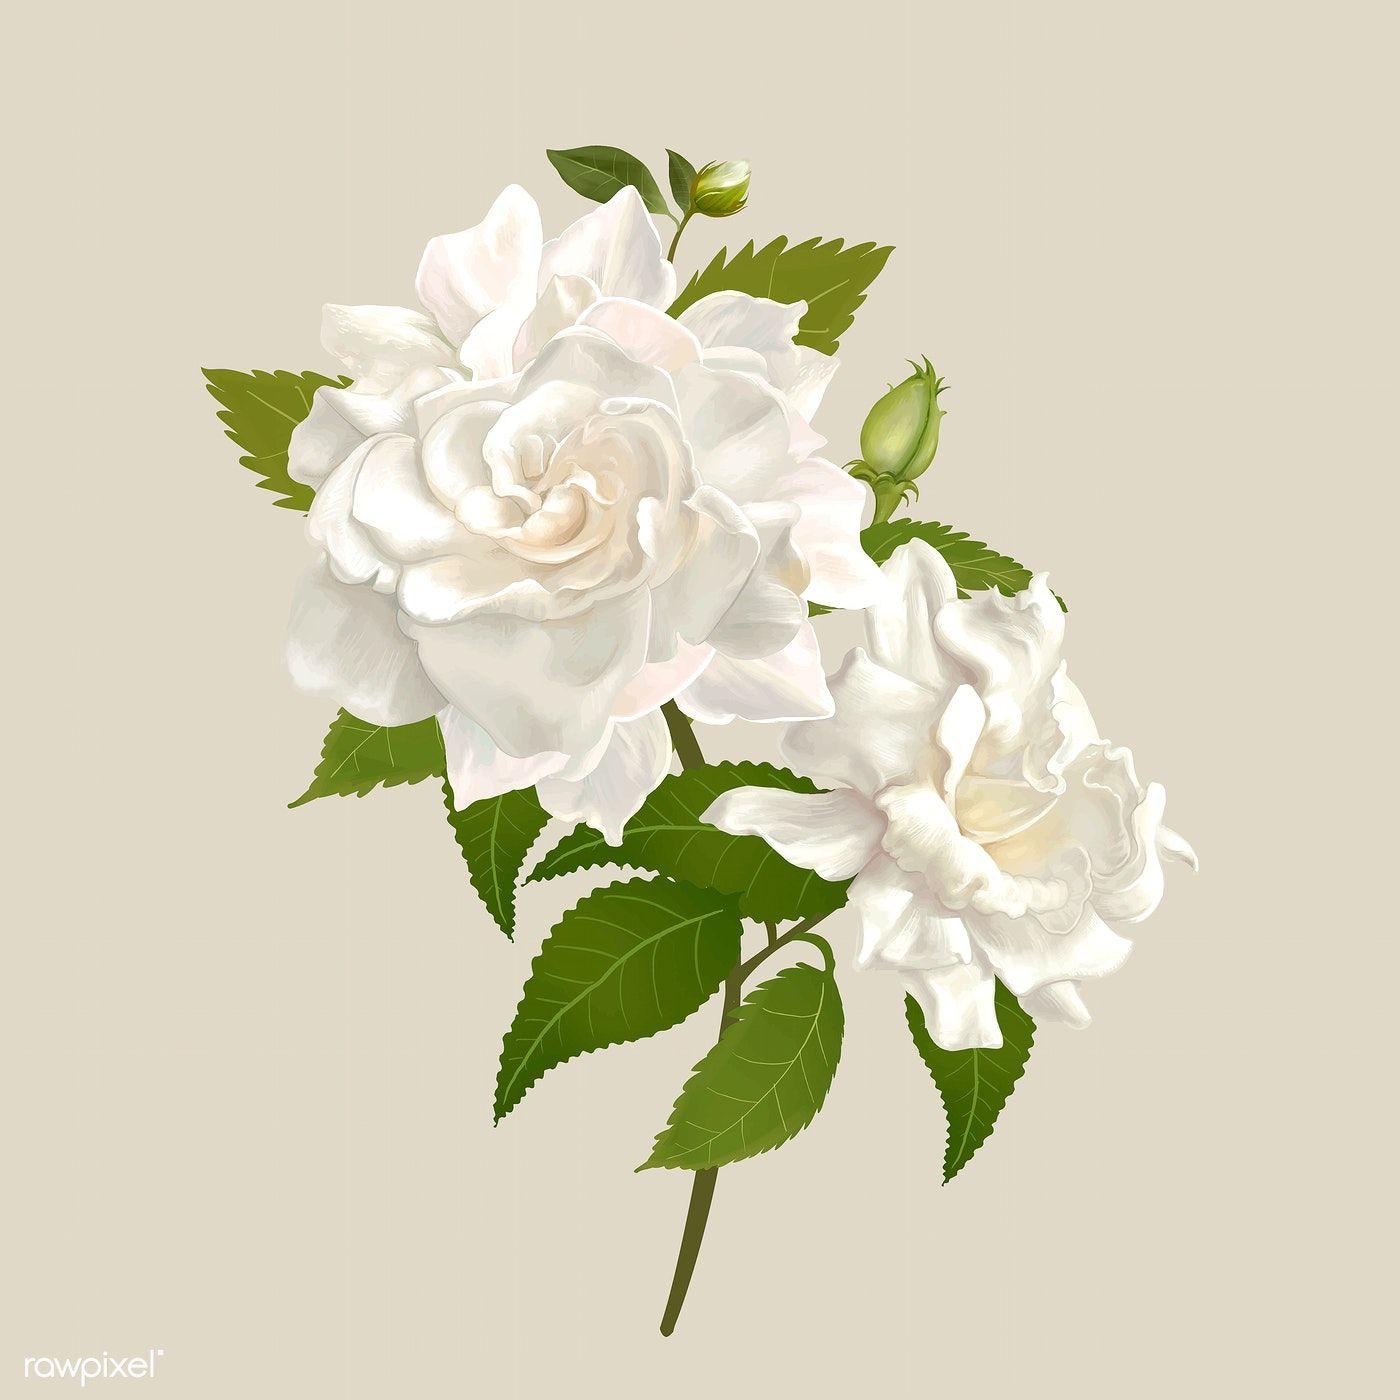 Beautiful Gardenia Flowering Plant Illustration Free Image By Rawpixel Com Adj In 2020 Plant Illustration Gardenia White Gardenia